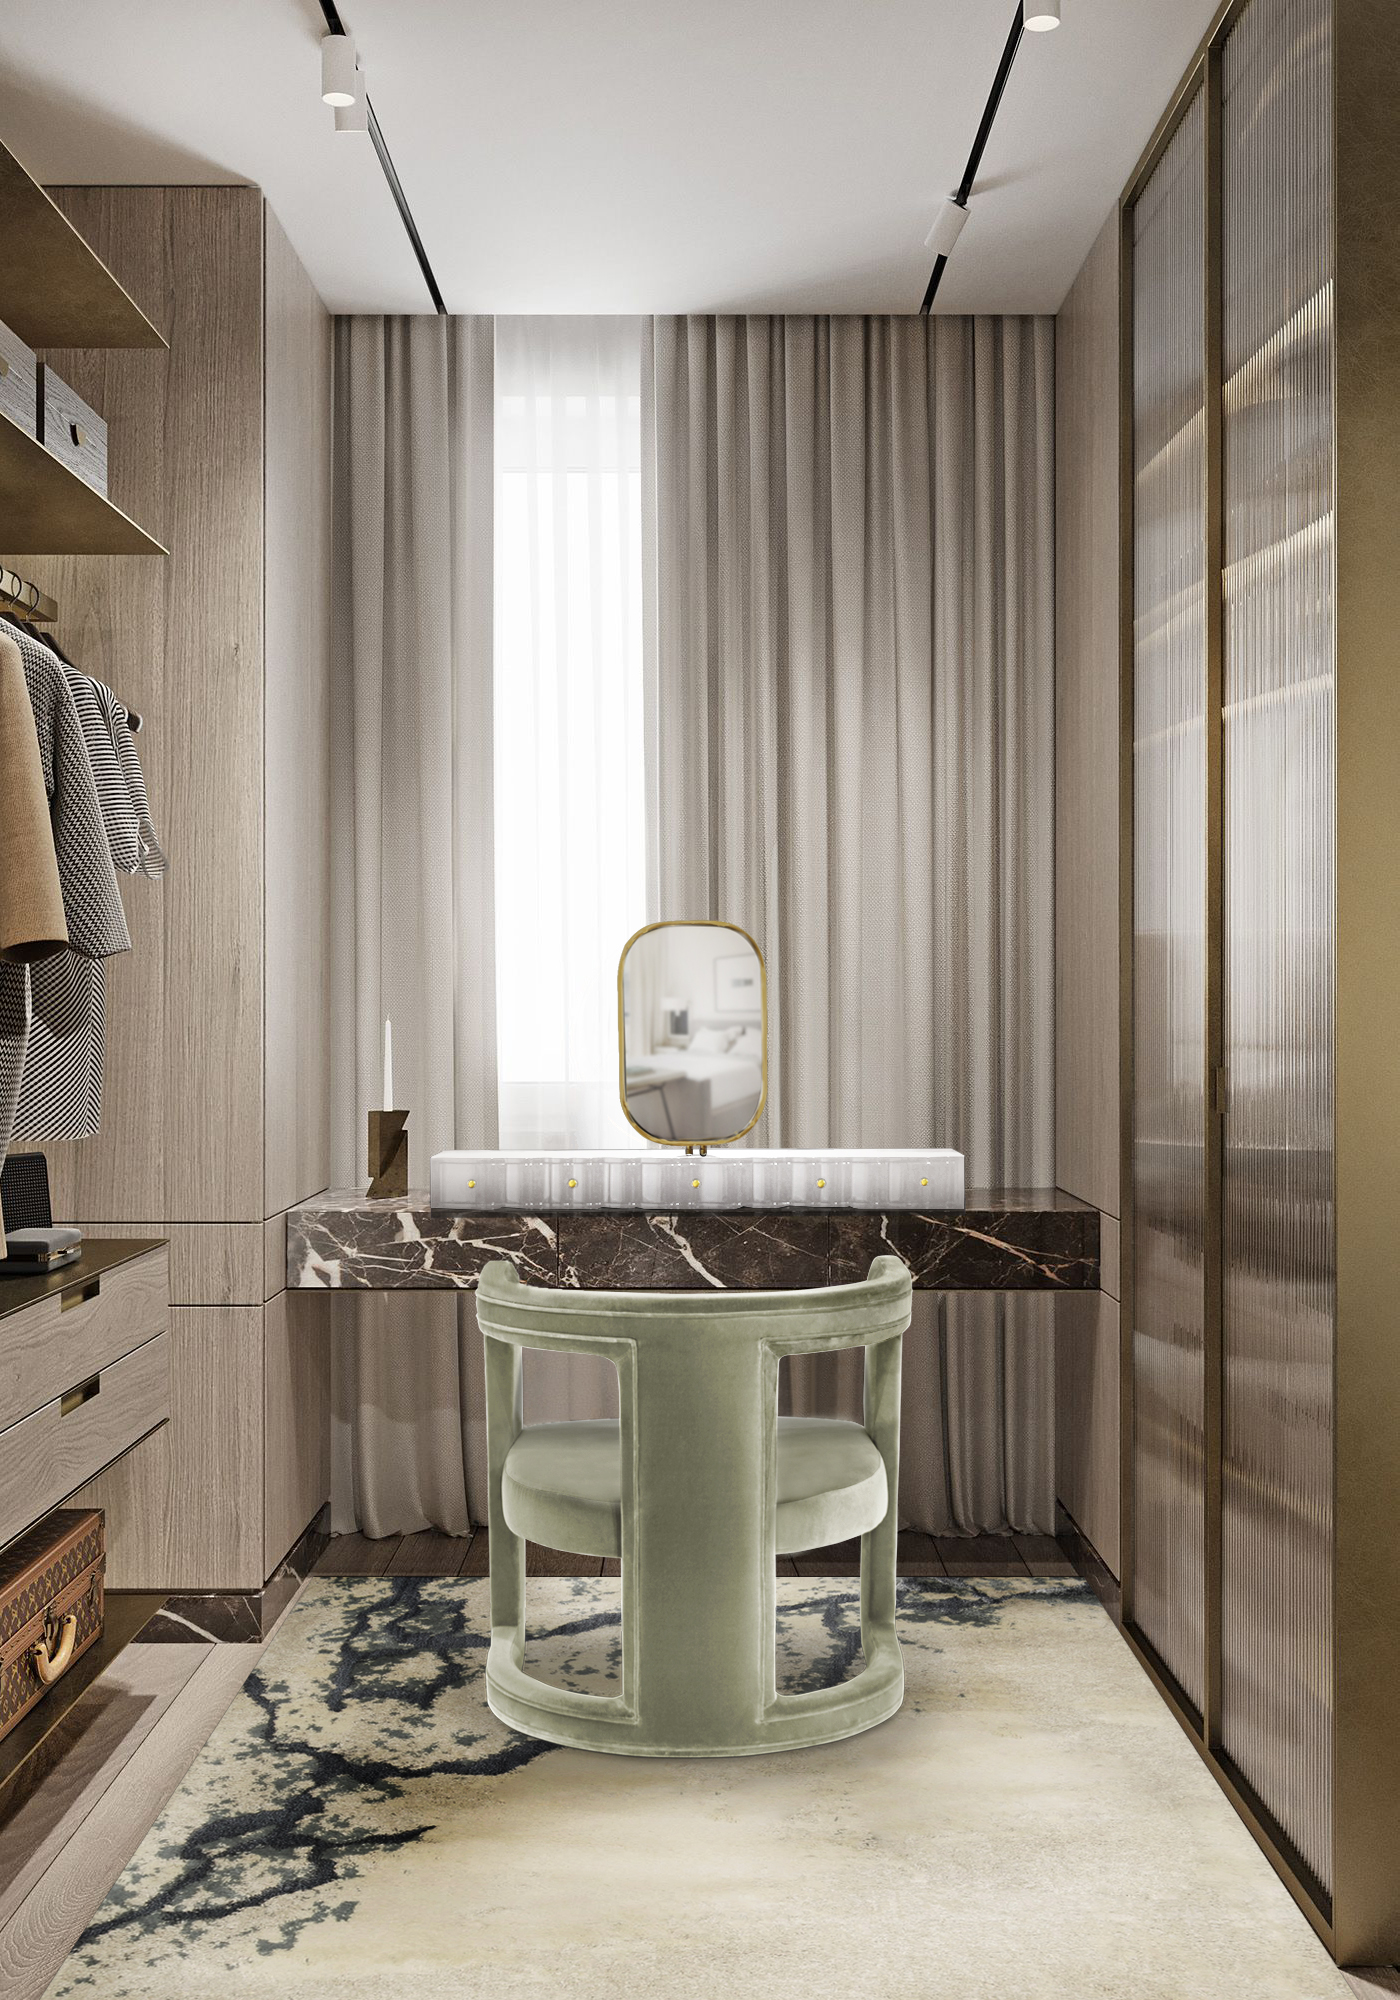 2020 interior design trends More 2020 Interior Design Trends: The Best New Ambiances More 2020 Interior Design Trends The Best New Ambiances 5